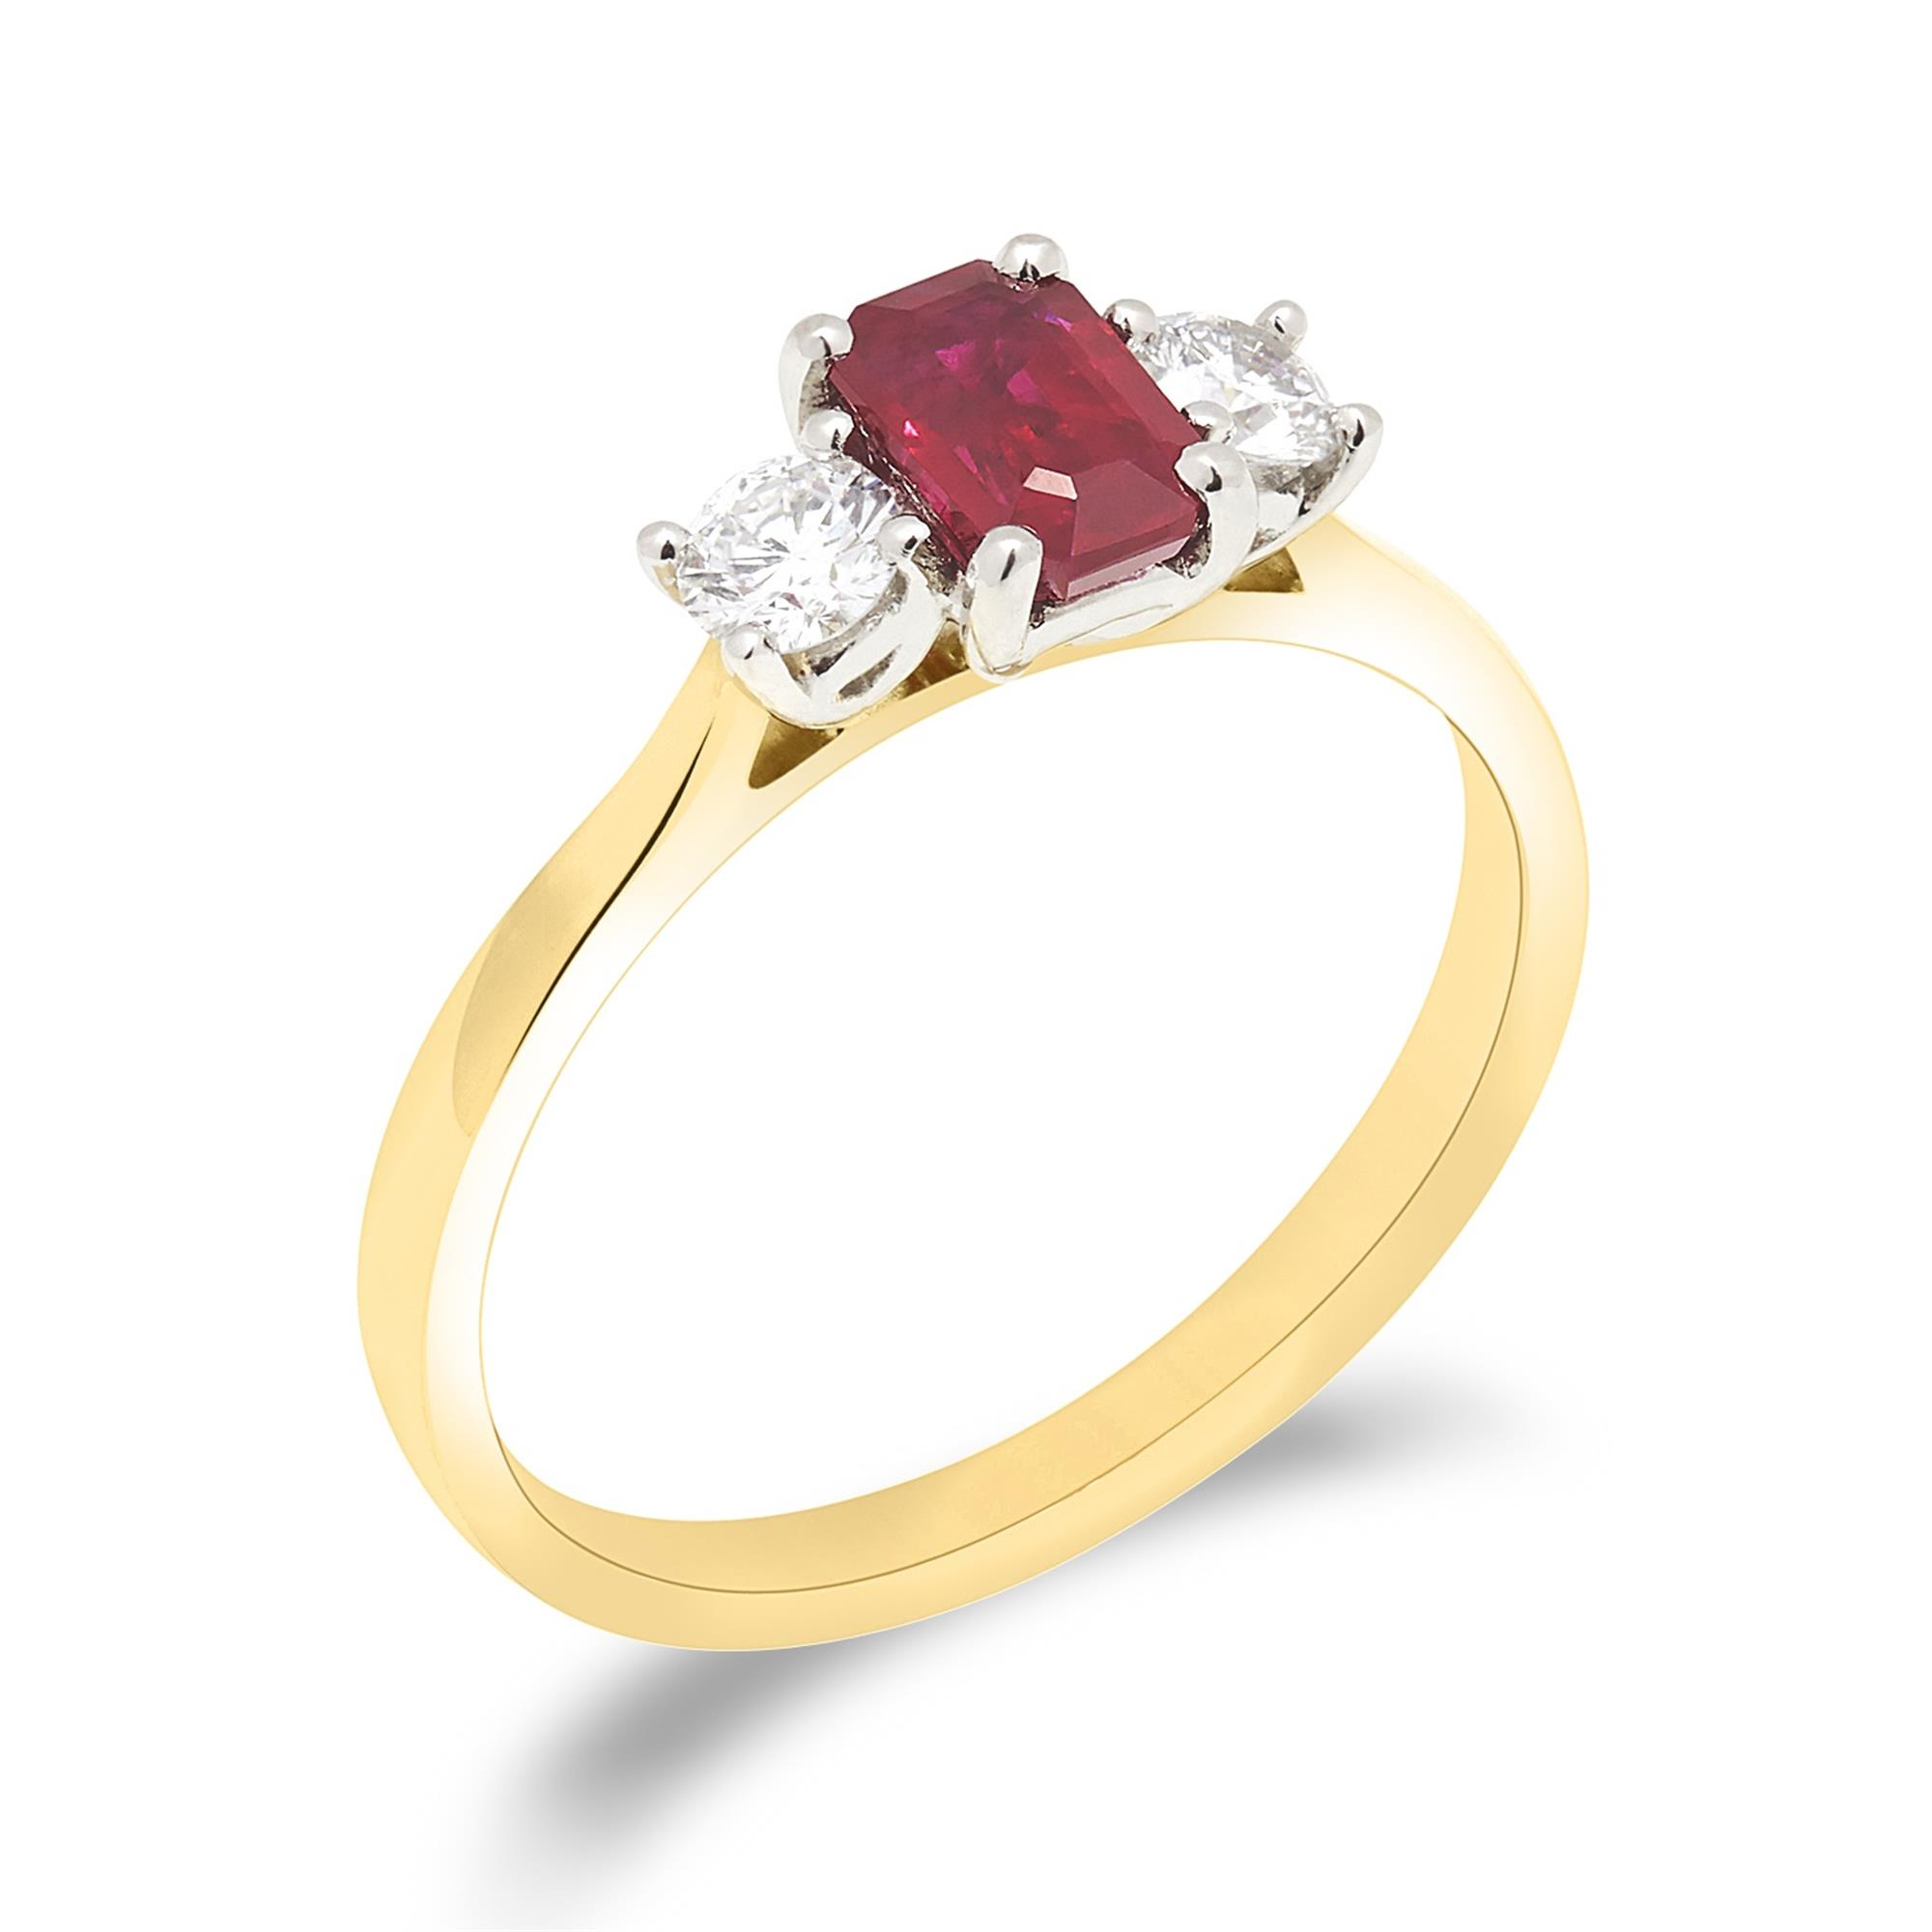 Emerald Cut Ruby And Diamond Ring Pravins